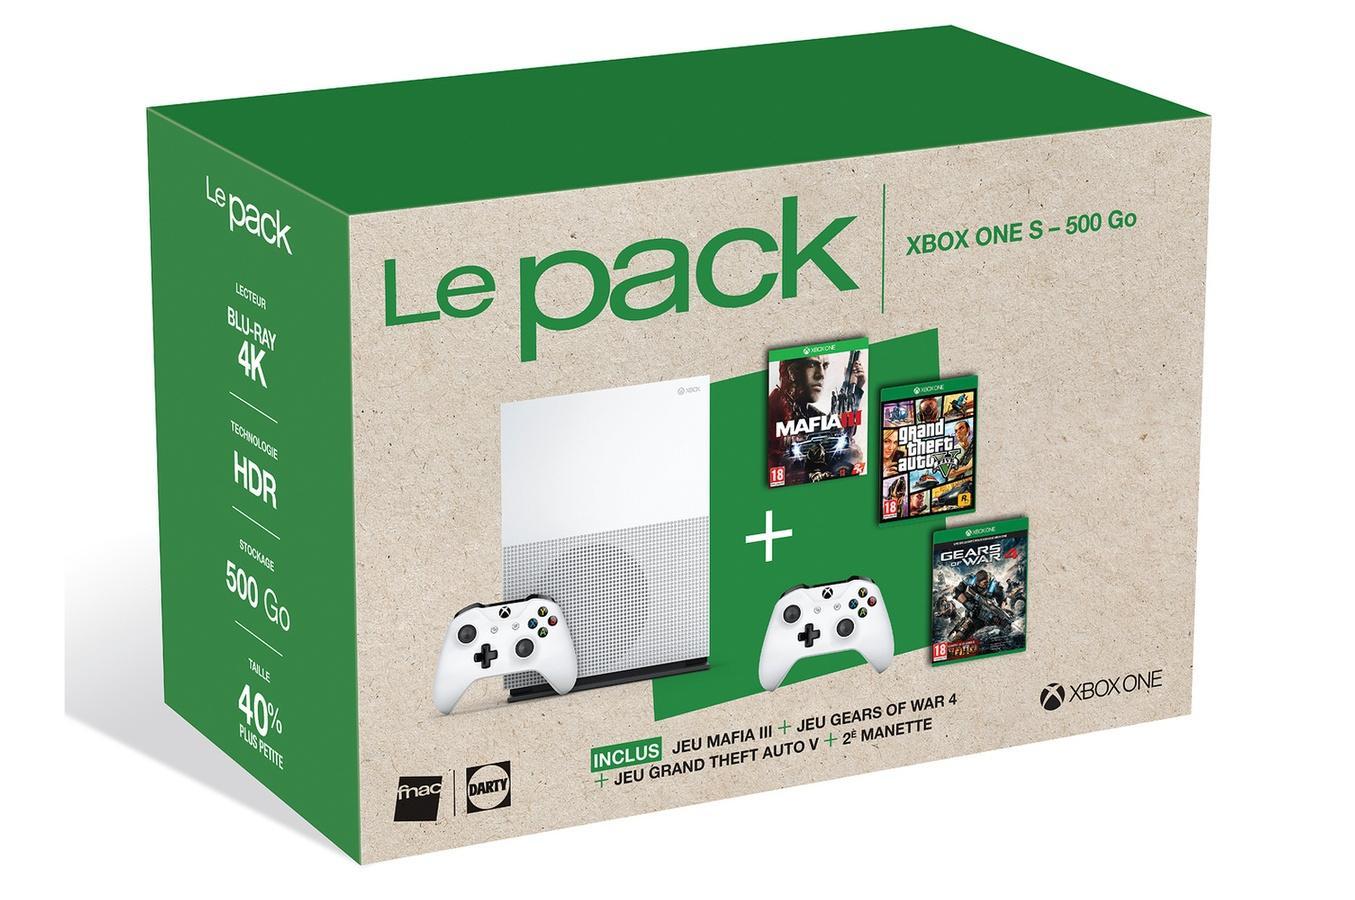 Pack Console Xbox One S 500 Go + Mafia III + GTA V + Gears of War 4 + 2ème Manette